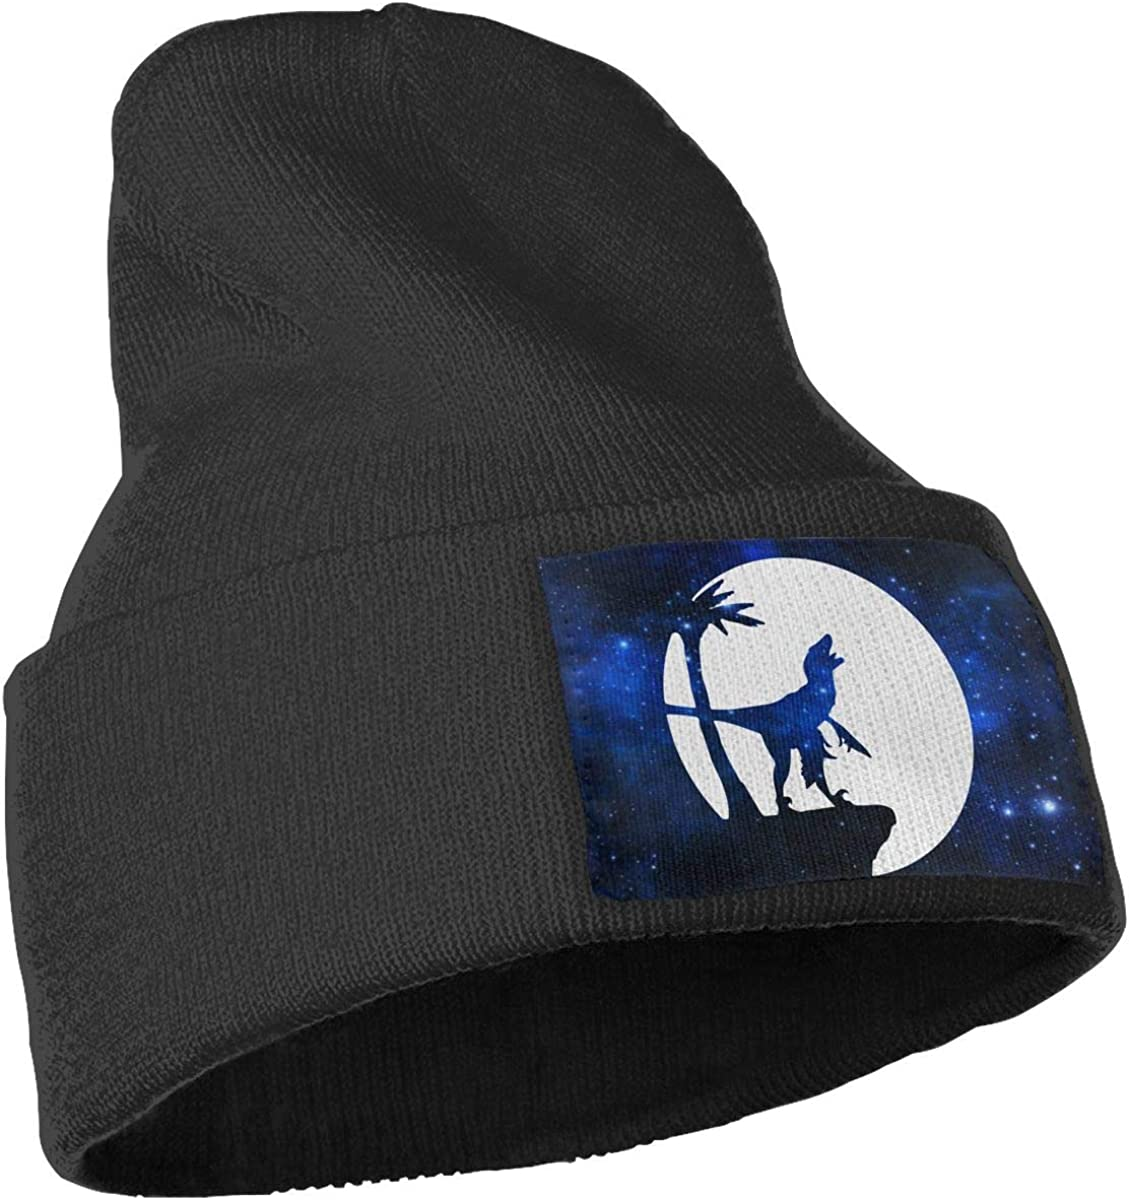 COLLJL-8 Unisex Raptor Moon Outdoor Warm Knit Beanies Hat Soft Winter Skull Caps